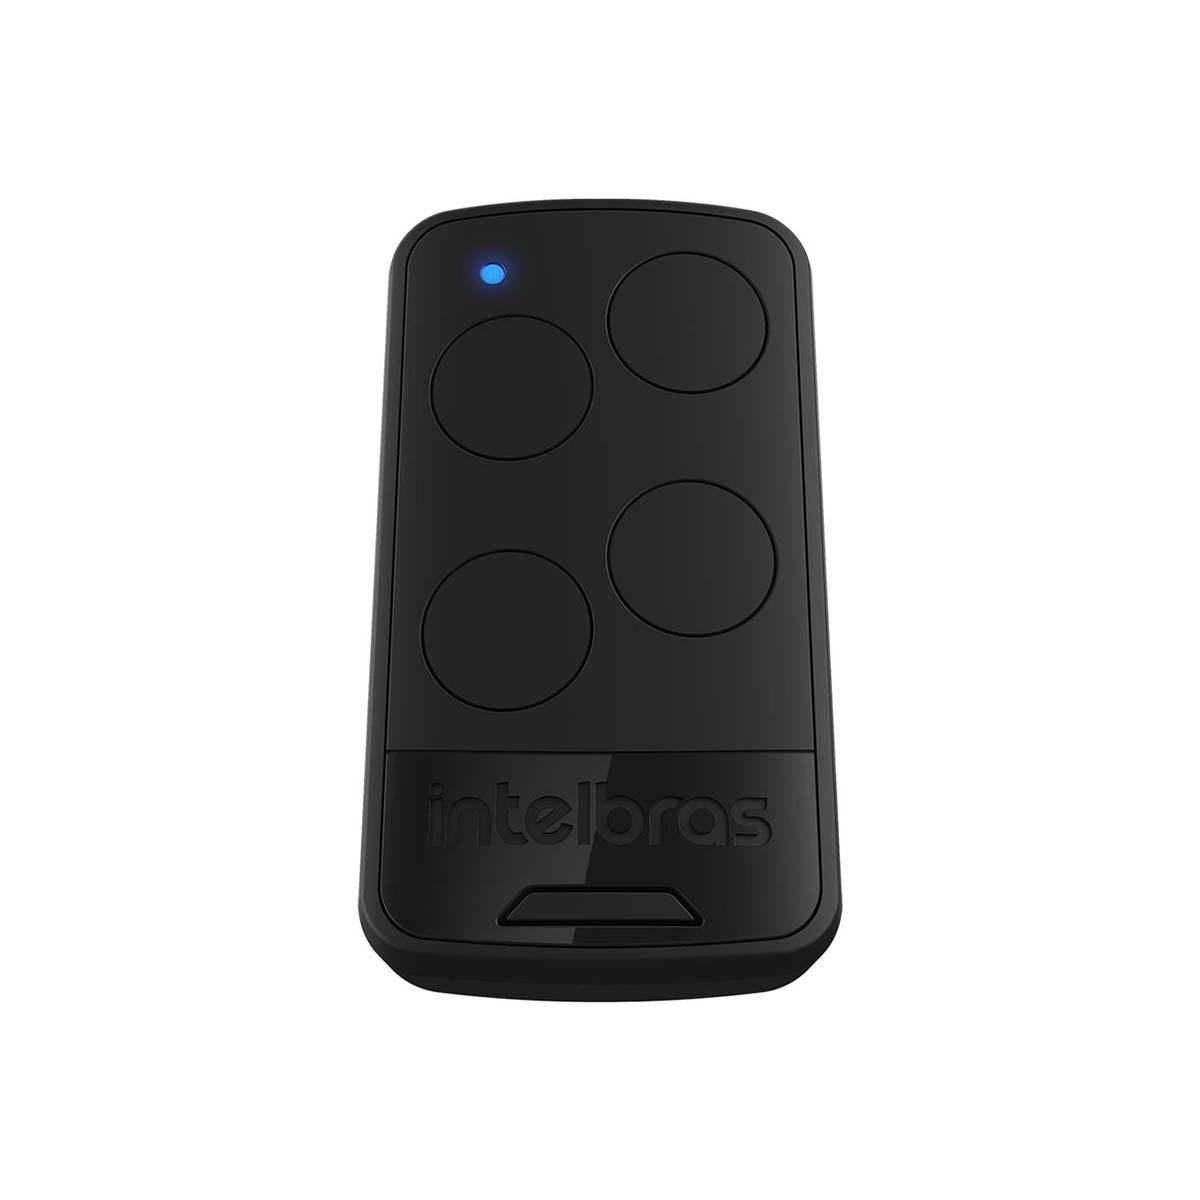 Kit 02 Controle Remoto Ep 04 Intelbras